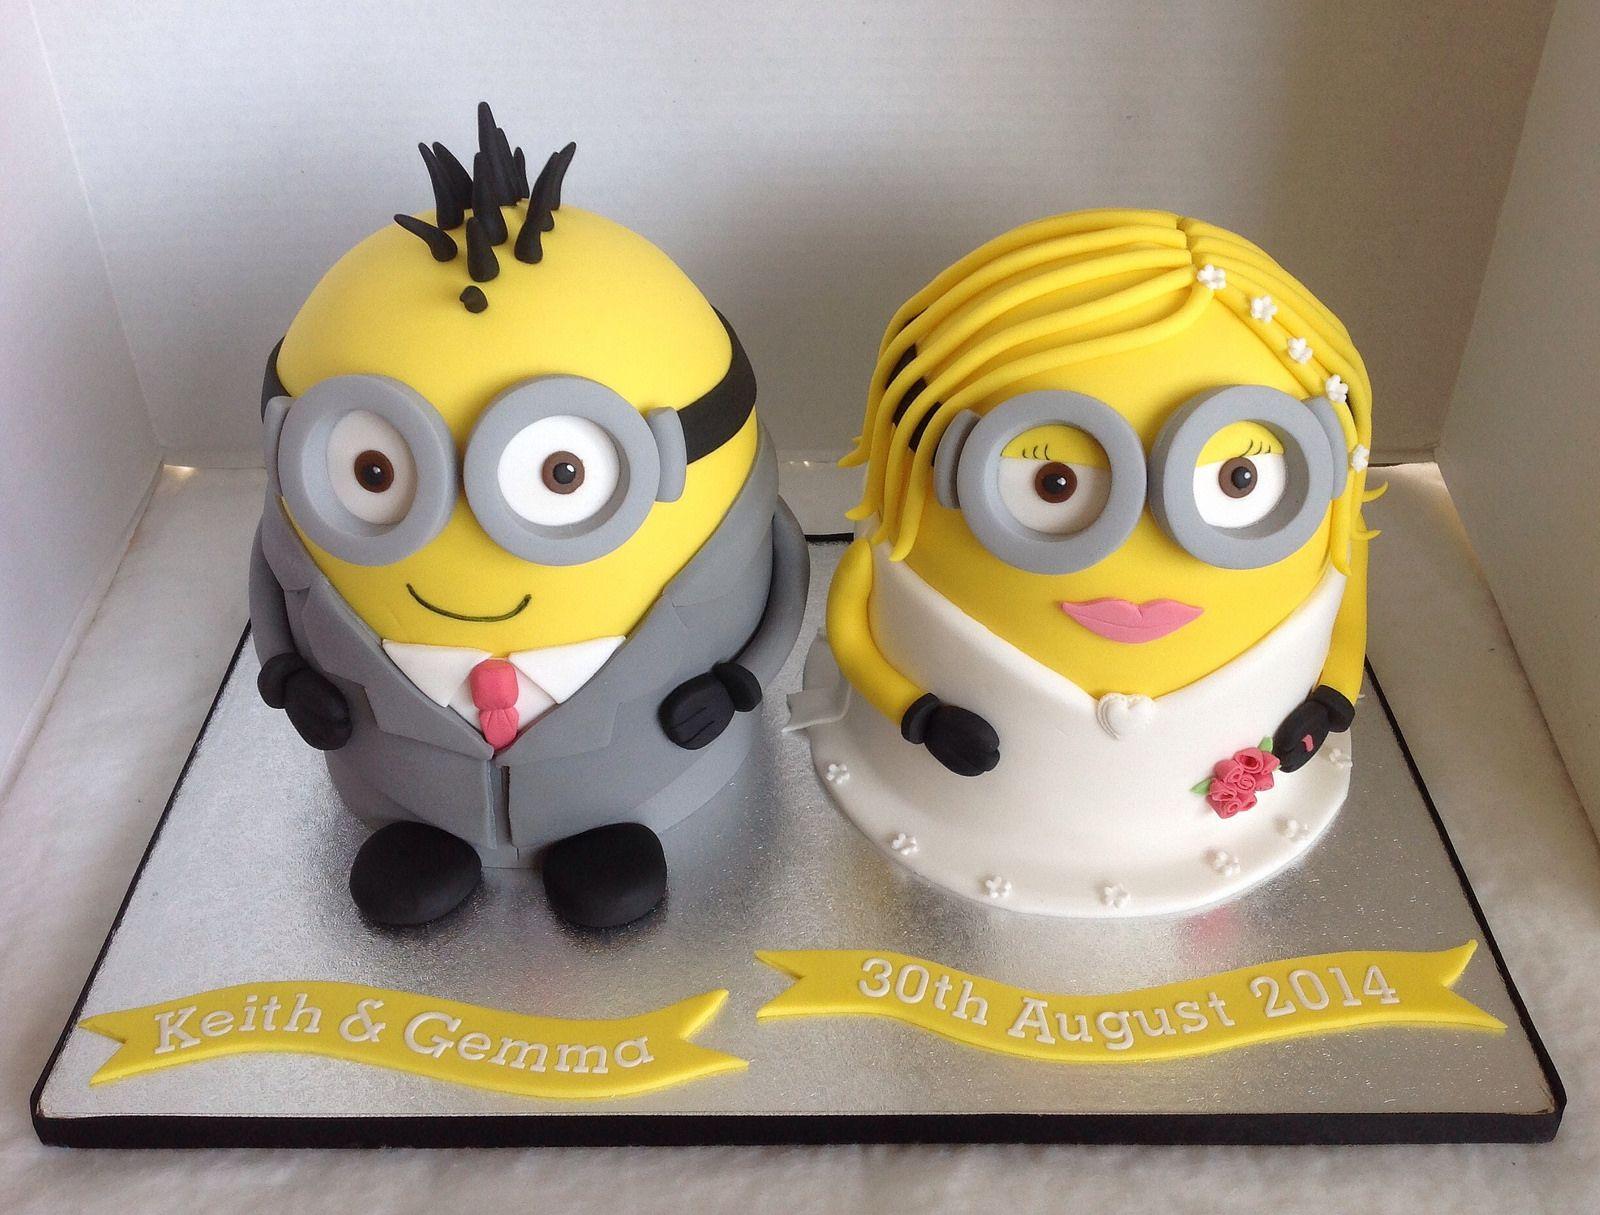 Minion Bride & Groom Wedding Cake | Baked goods | Pinterest ...